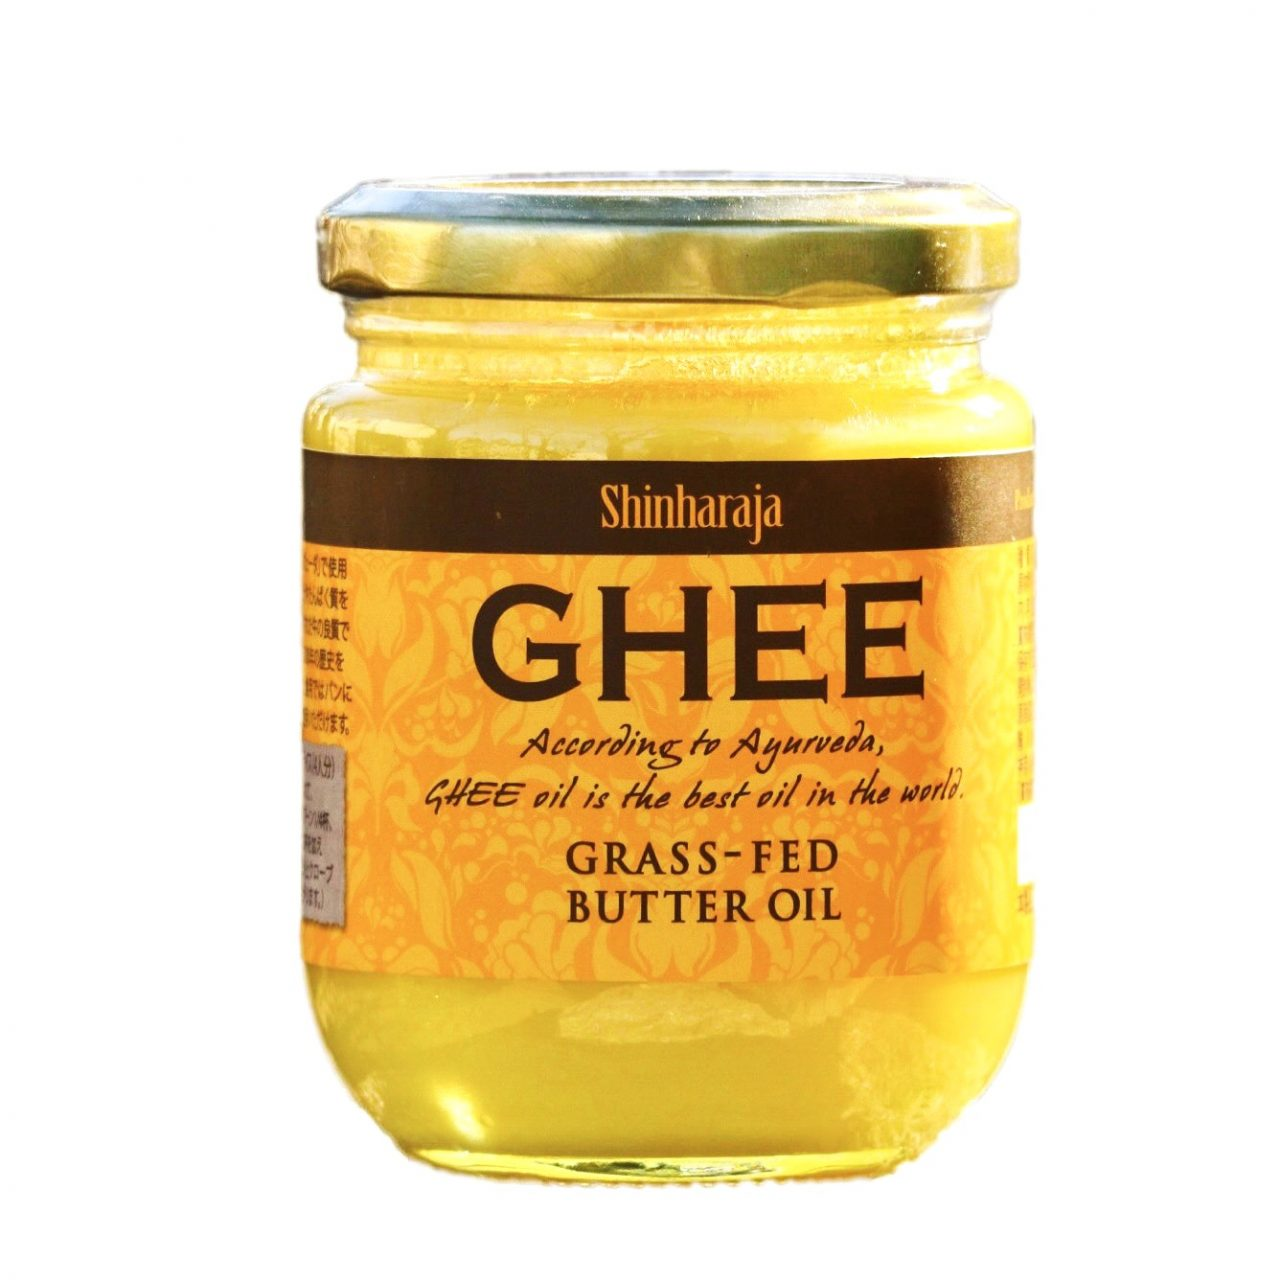 GHEE ギー「シンハラ―ジャギー」ボトル